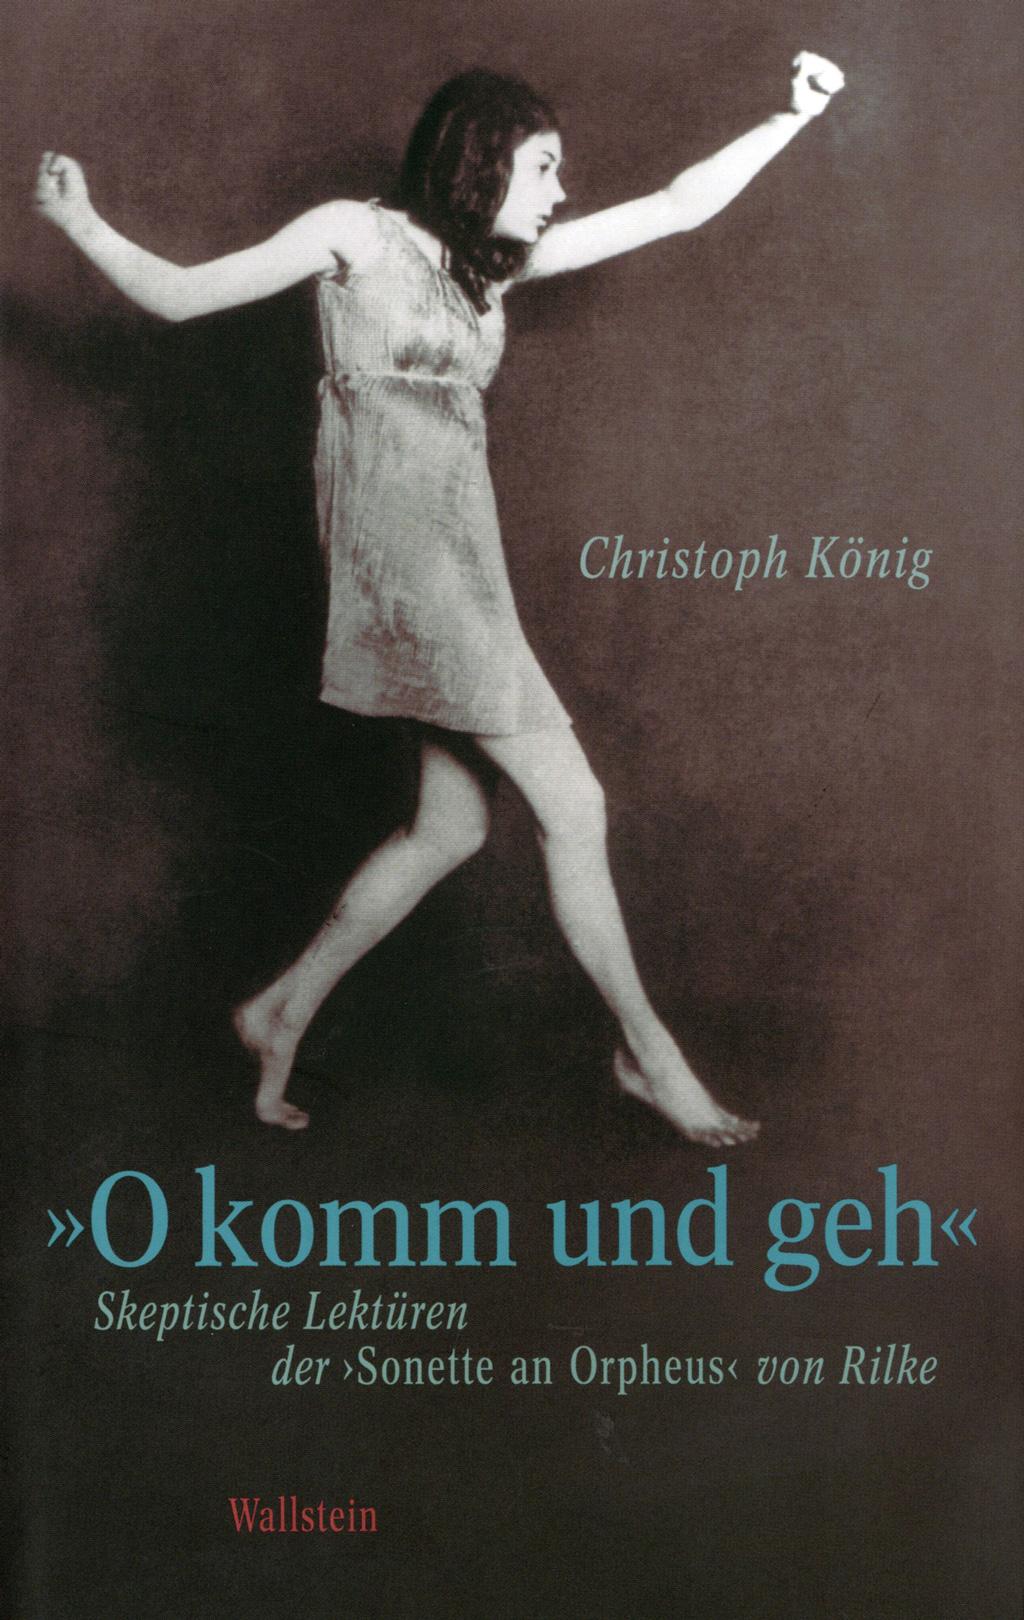 Couverture du livre «O Komn und geh», 2014